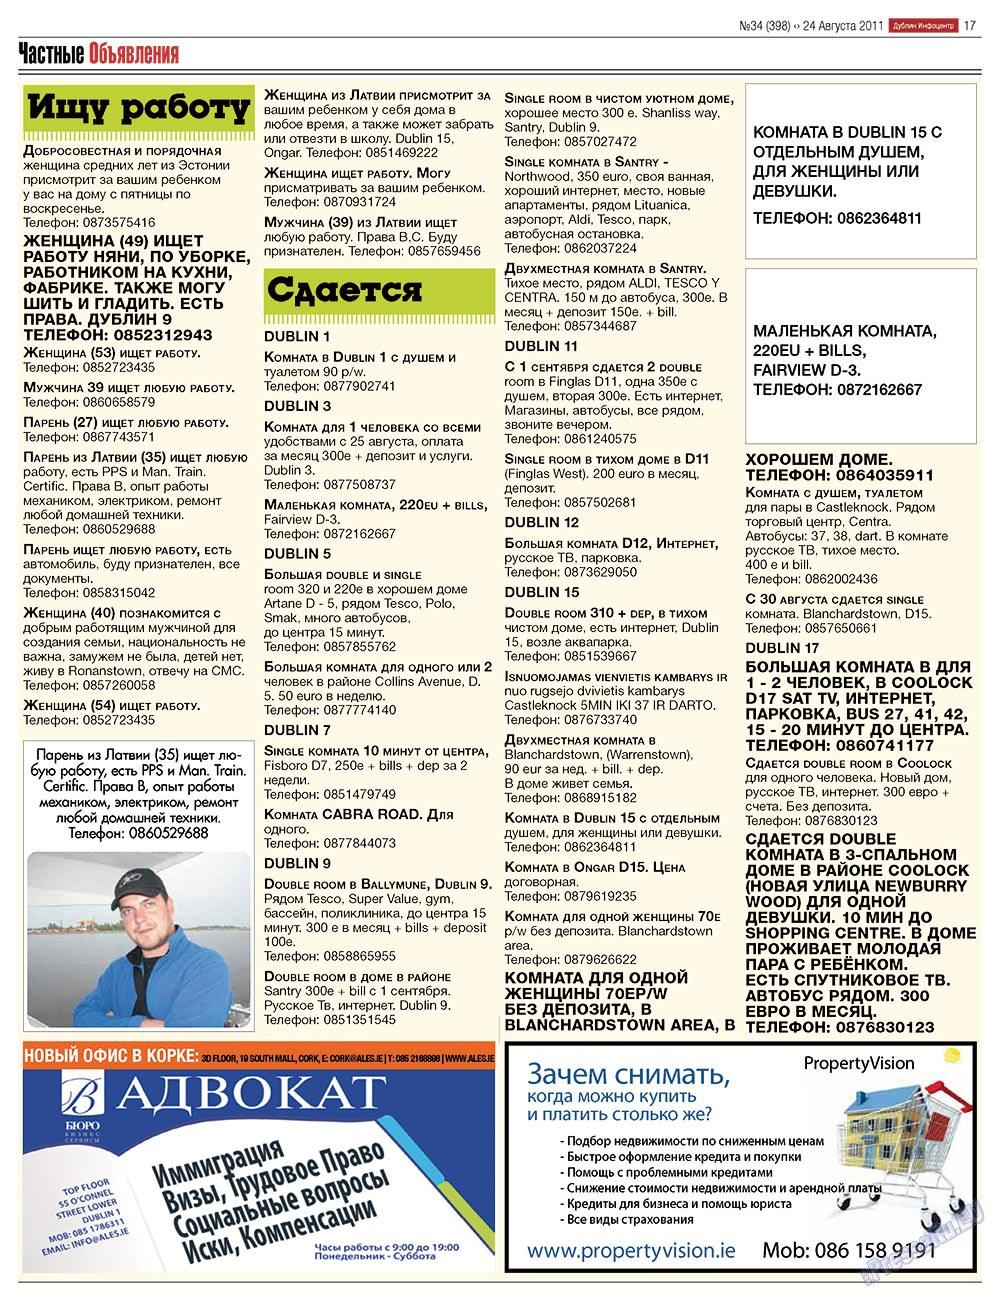 Дублин инфоцентр (газета). 2011 год, номер 34, стр. 17